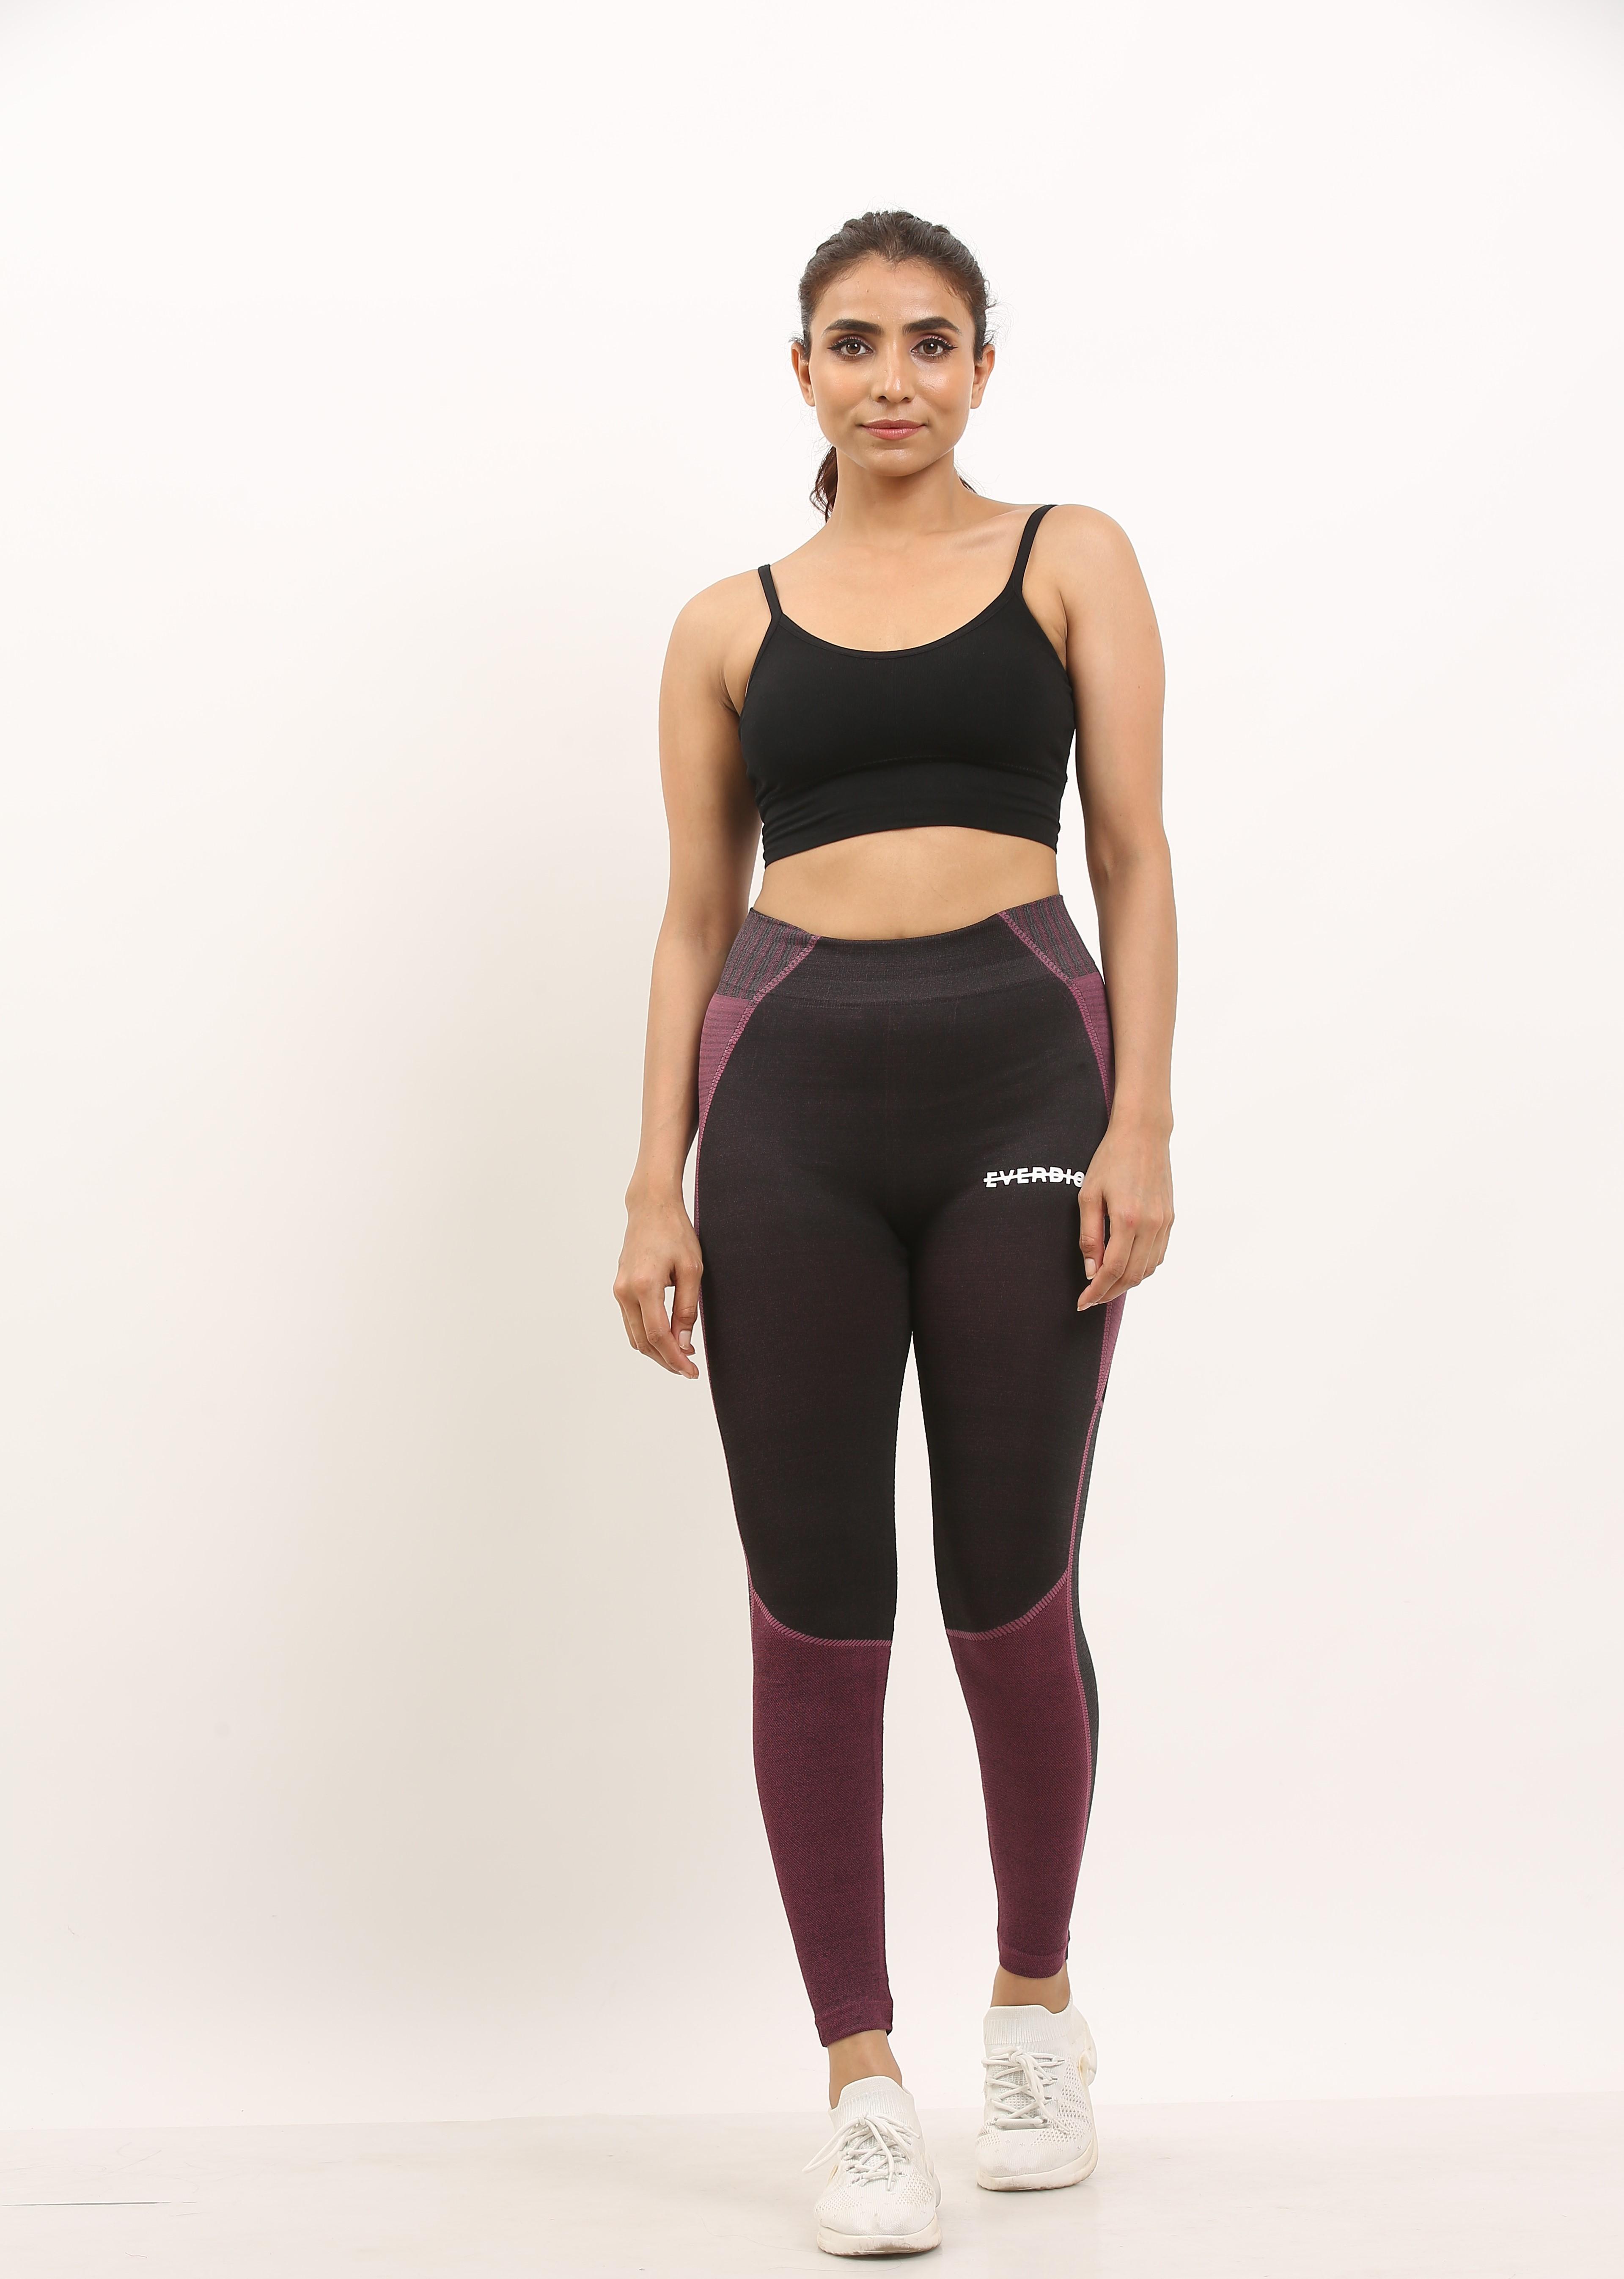 EVERDION | Purple Black Yoga Set